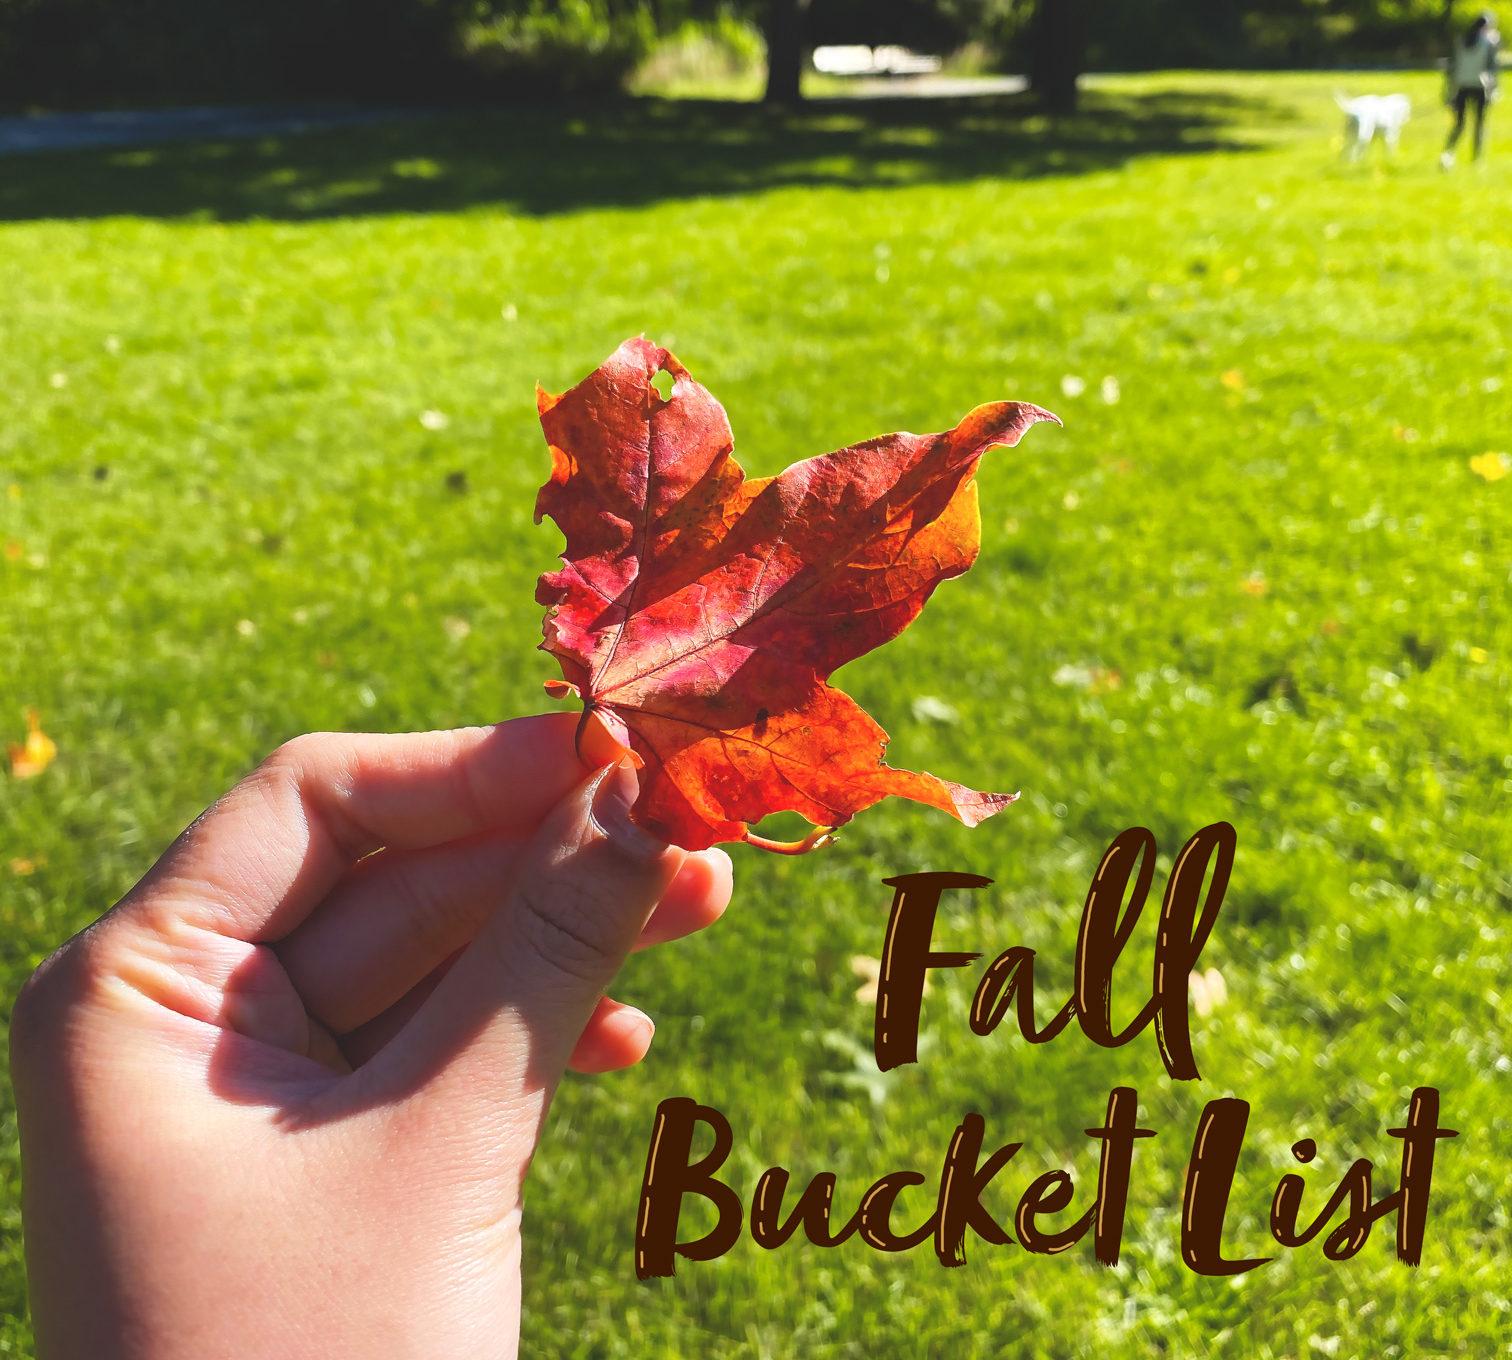 Fall 2020 Bucket List: Corona-safe activities to do this fall